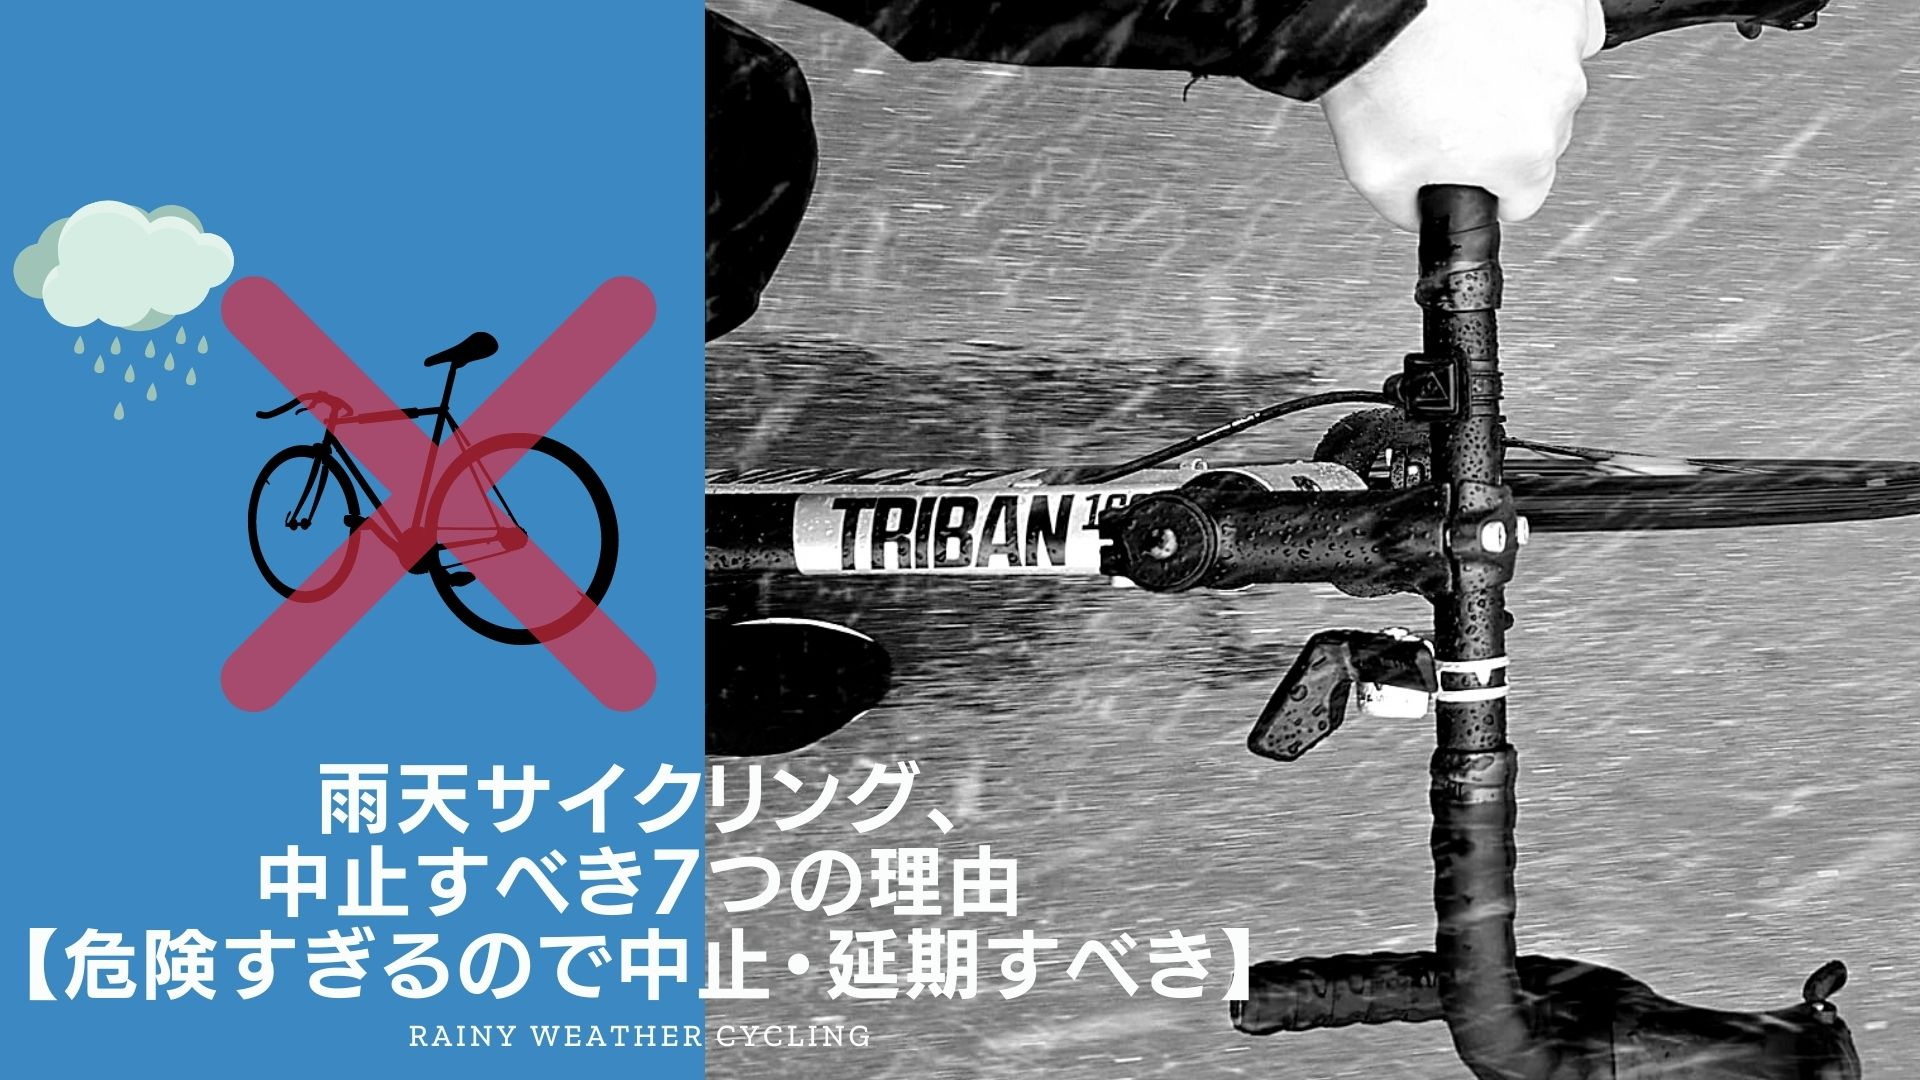 Rainy weather cycling